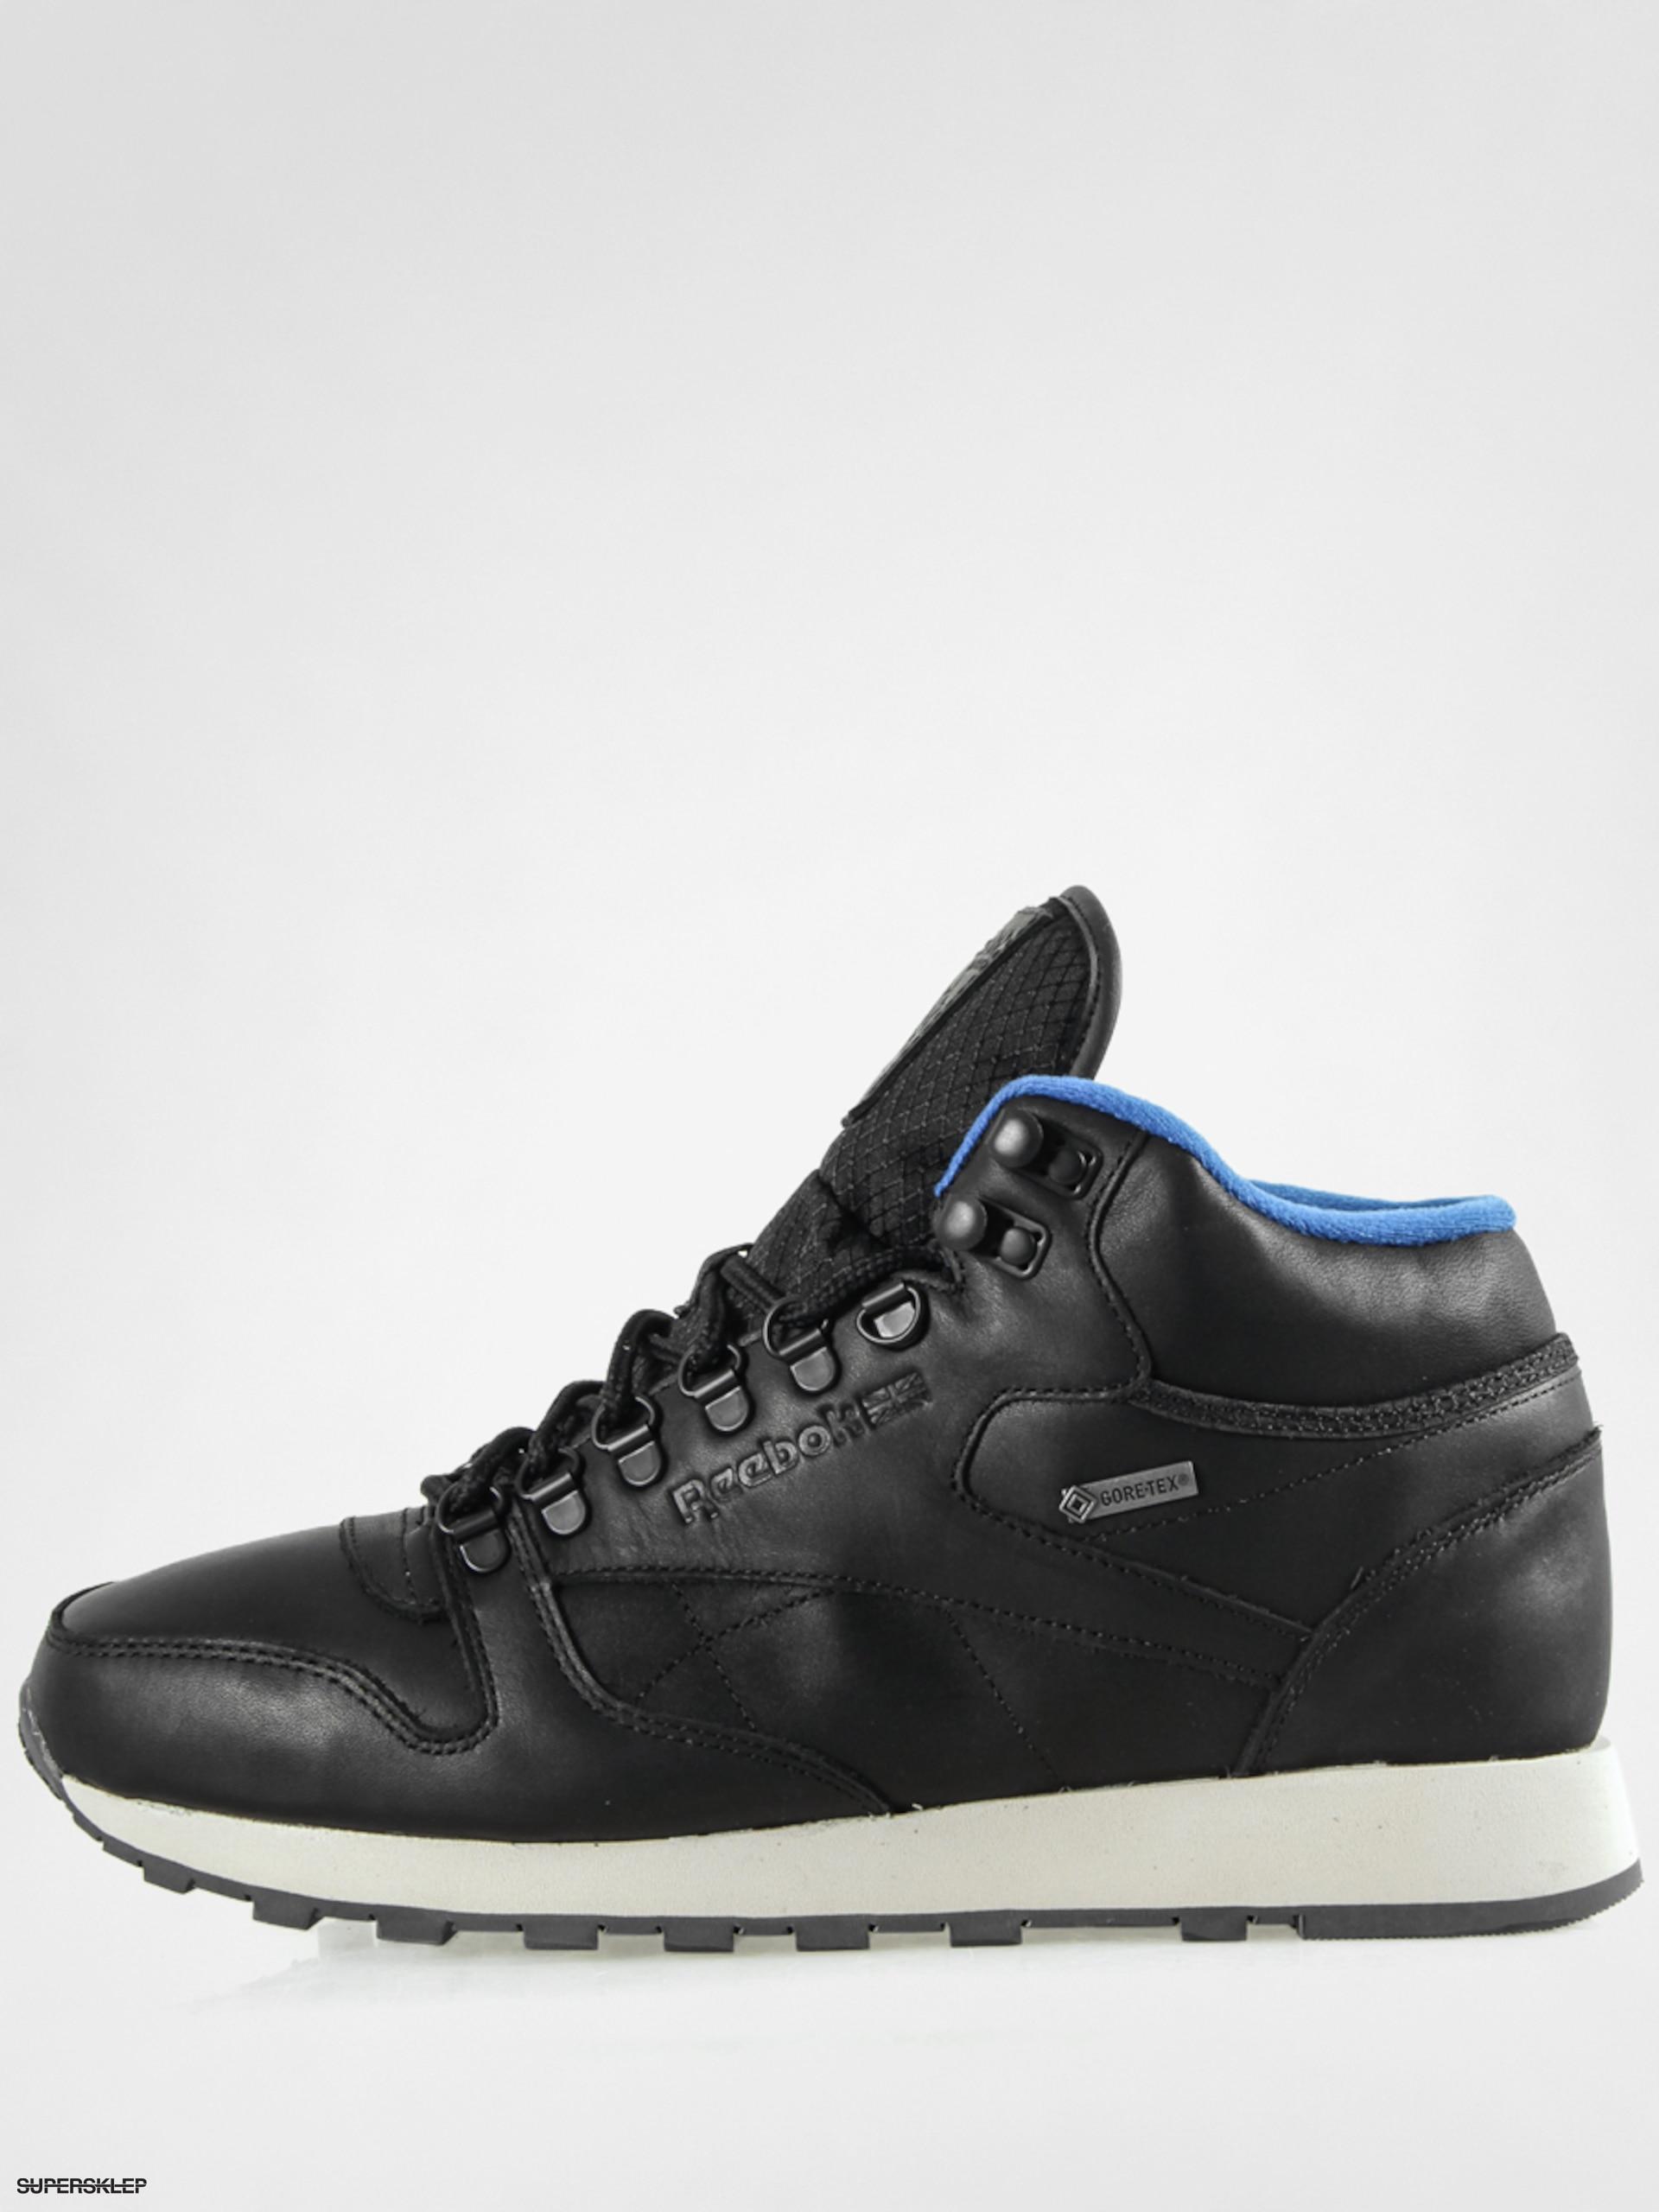 reebok classic leather mid gore tex